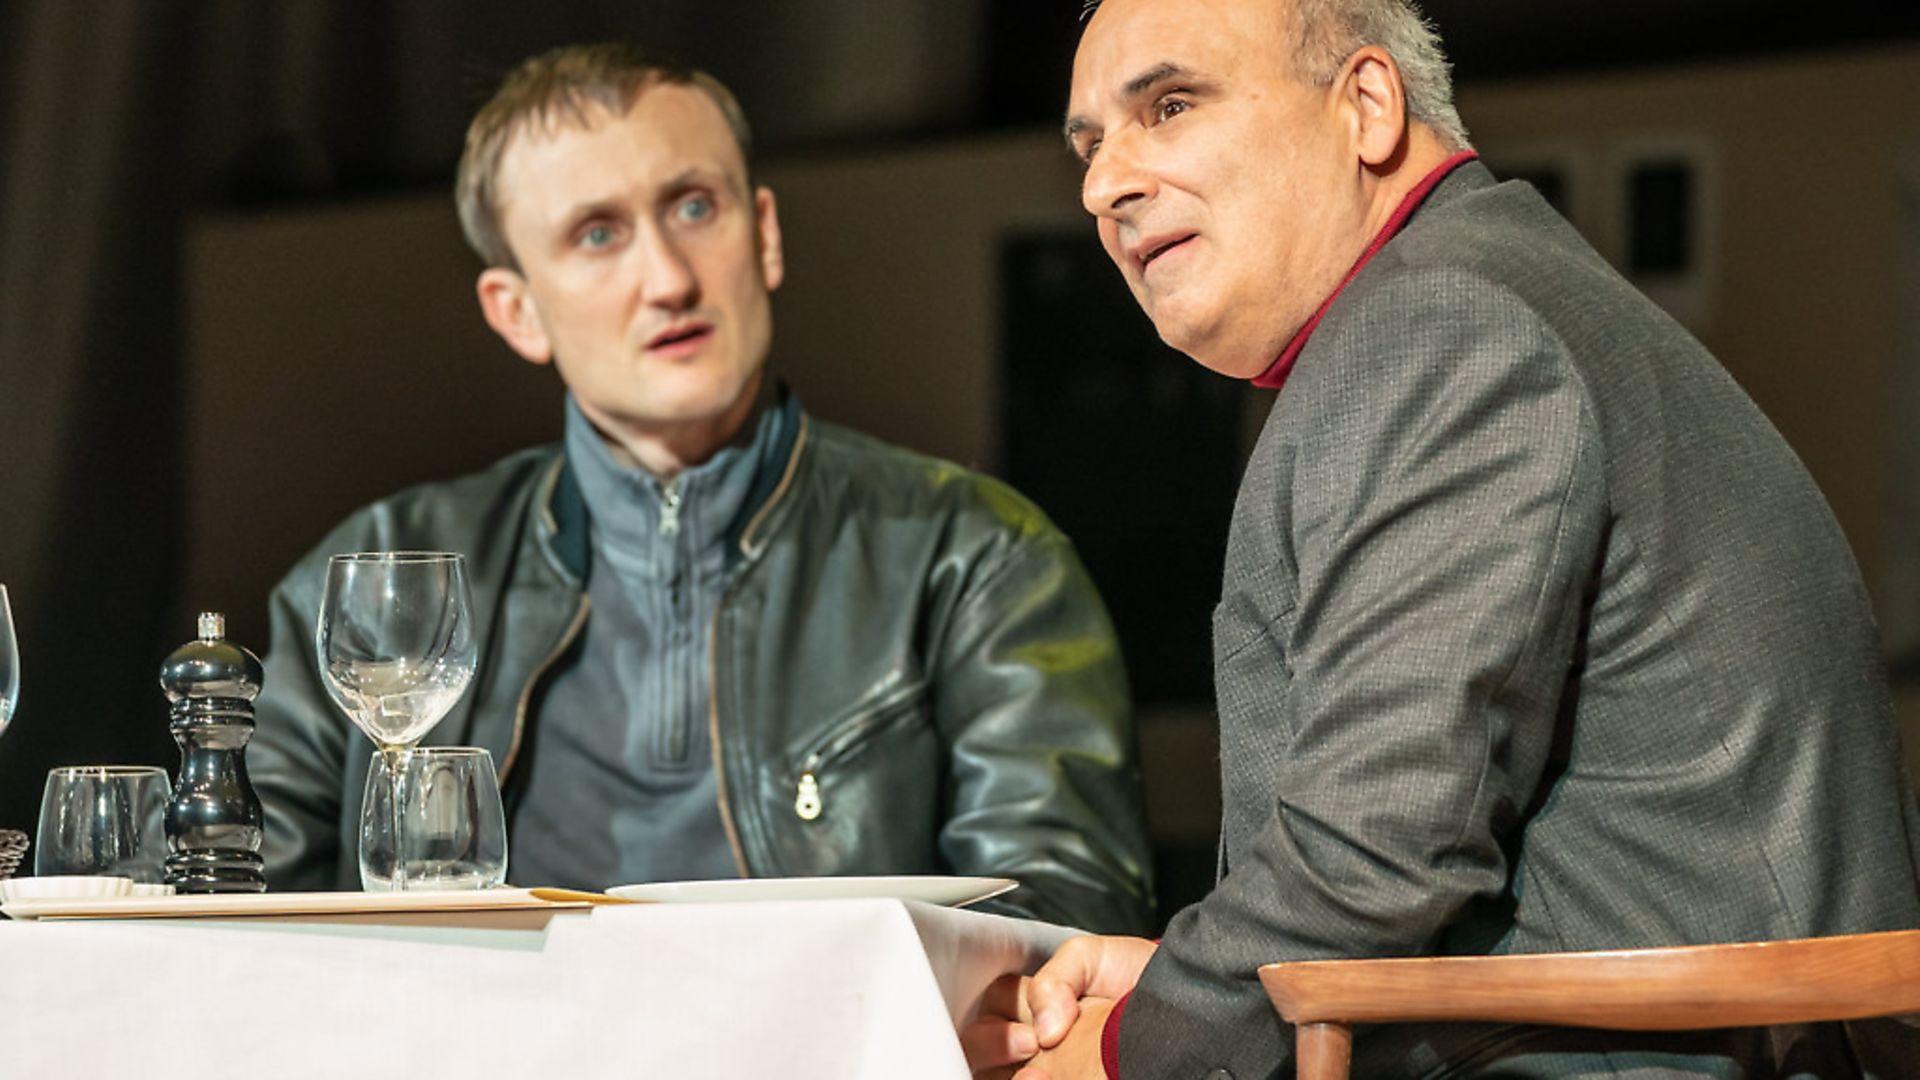 Tom Brooke as Alexander Litvinenko and Peter Polycarpou as Boris Berezovsky in A Very Expensive Poison - Credit: Archant